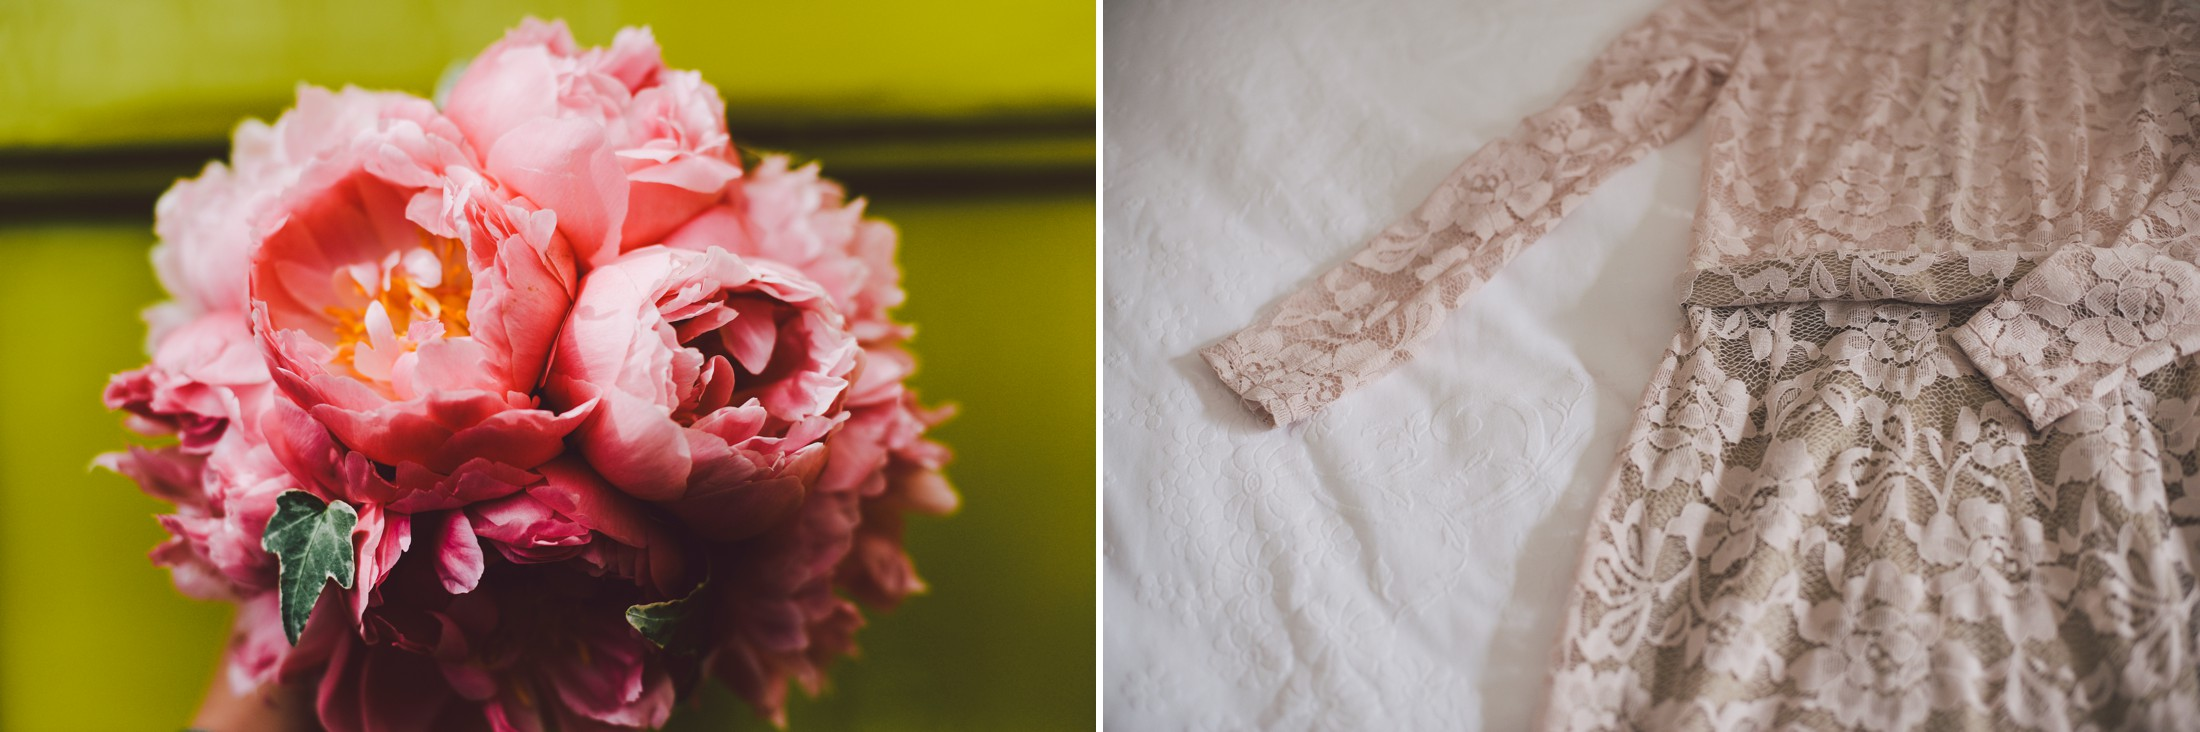 collage peony wedding bouquet and bride's wedding dress